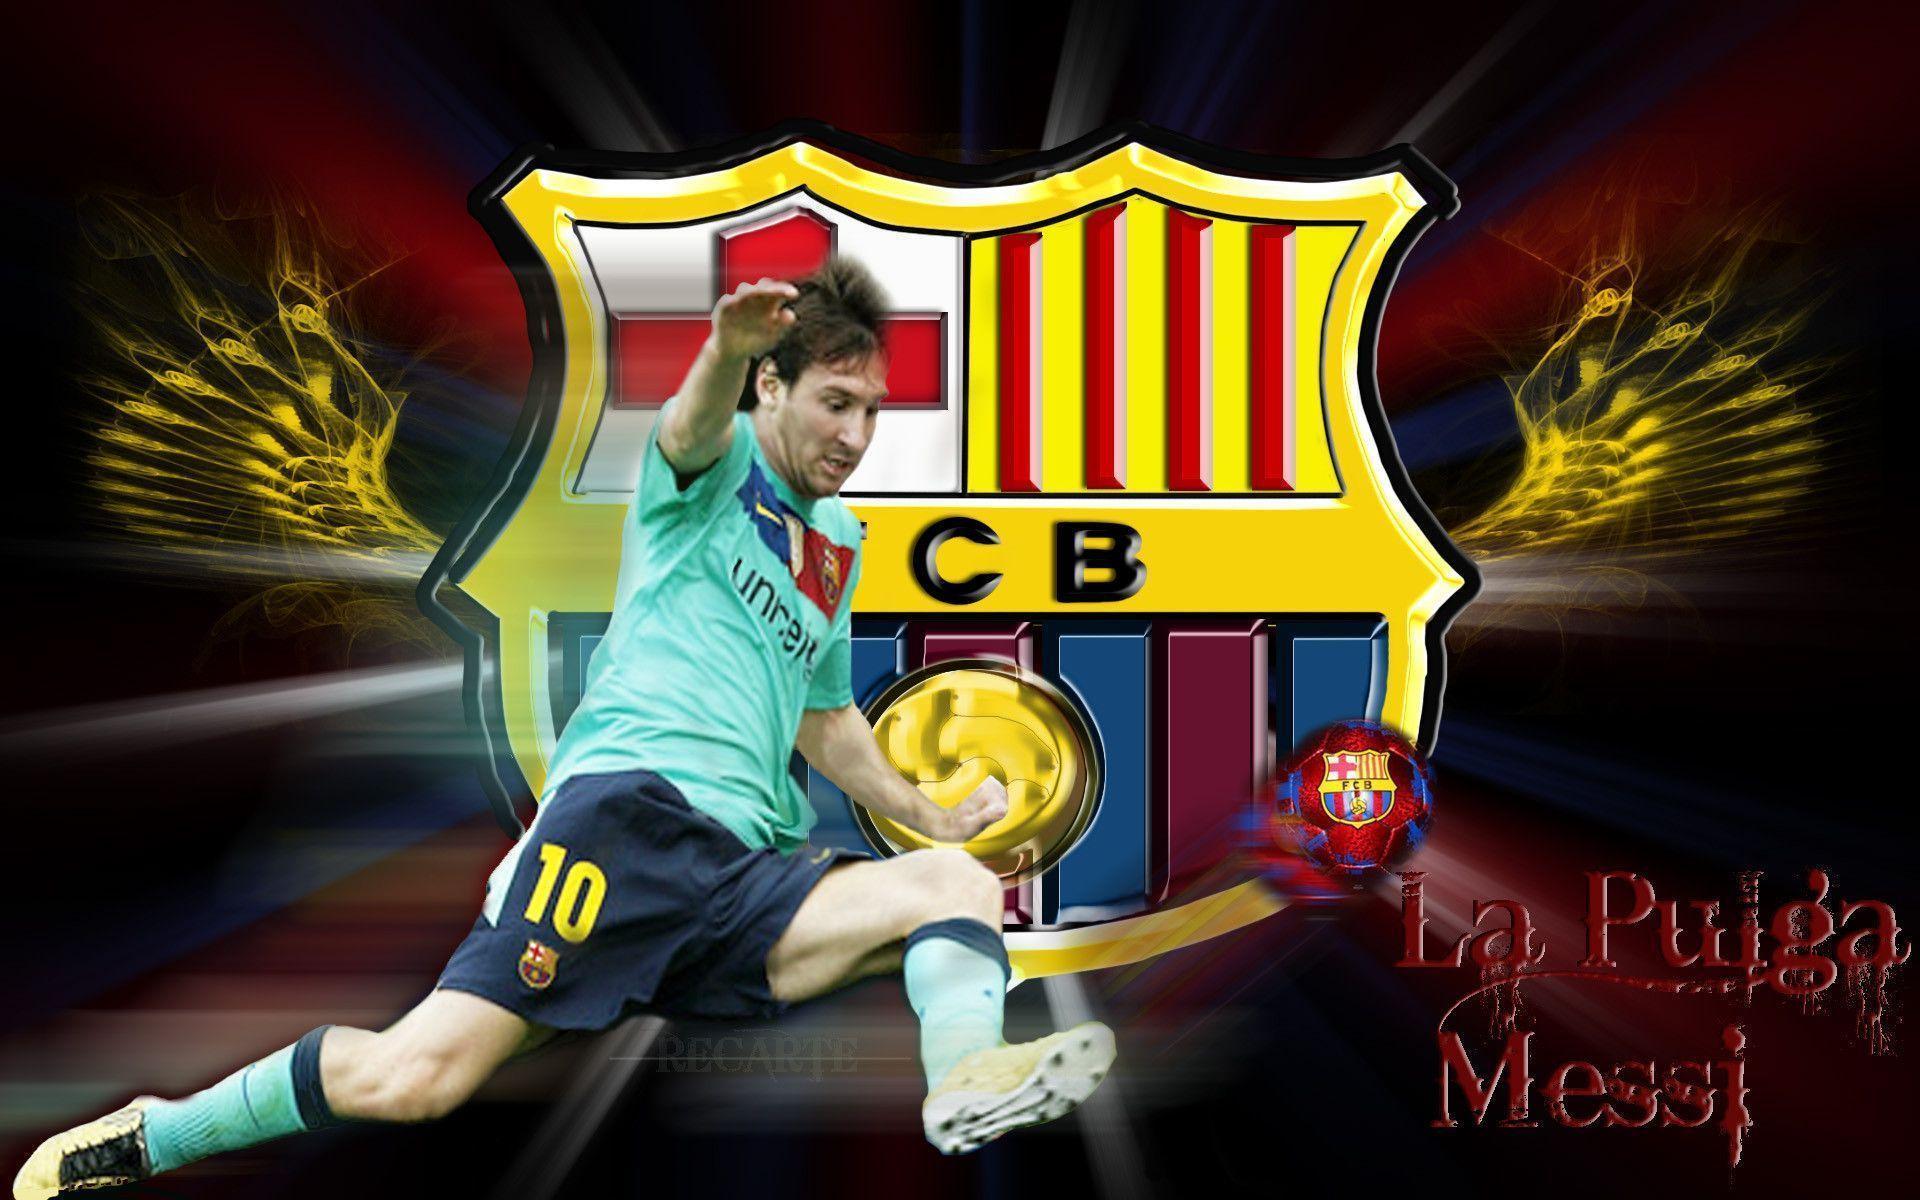 Download Hd Wallpaper Of Messi